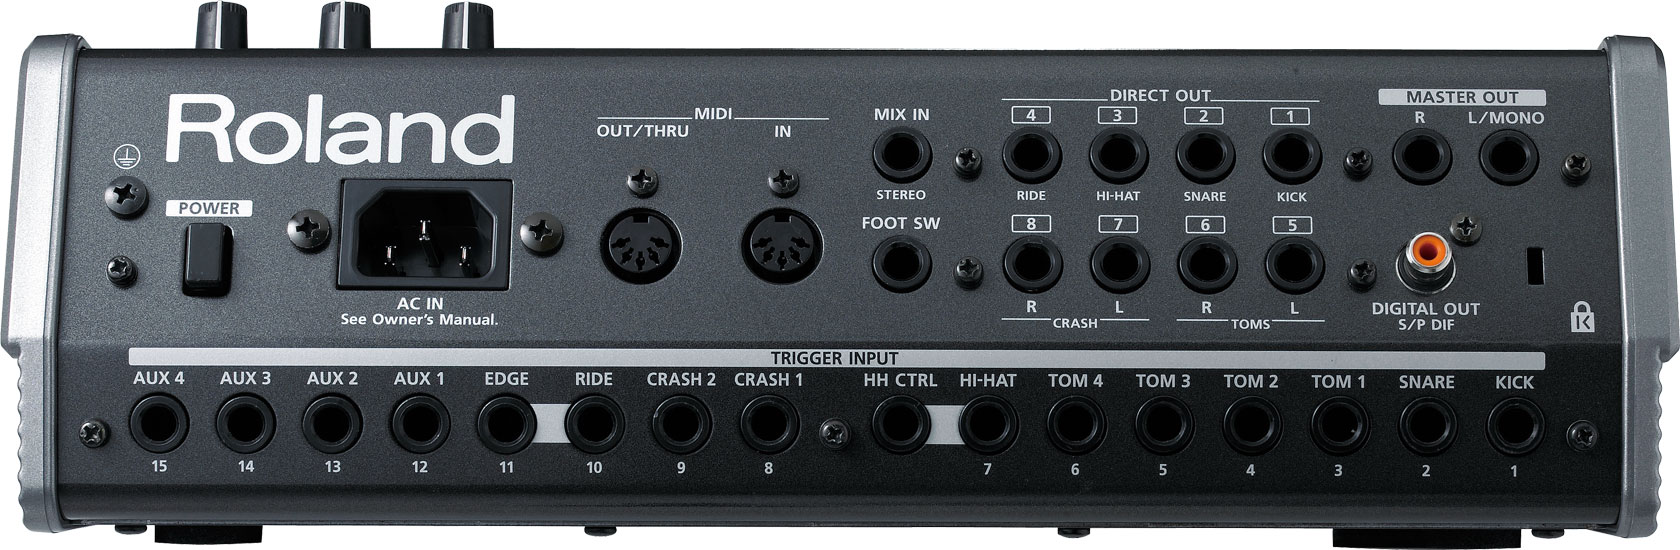 Roland Td 20x Percussion Sound Module